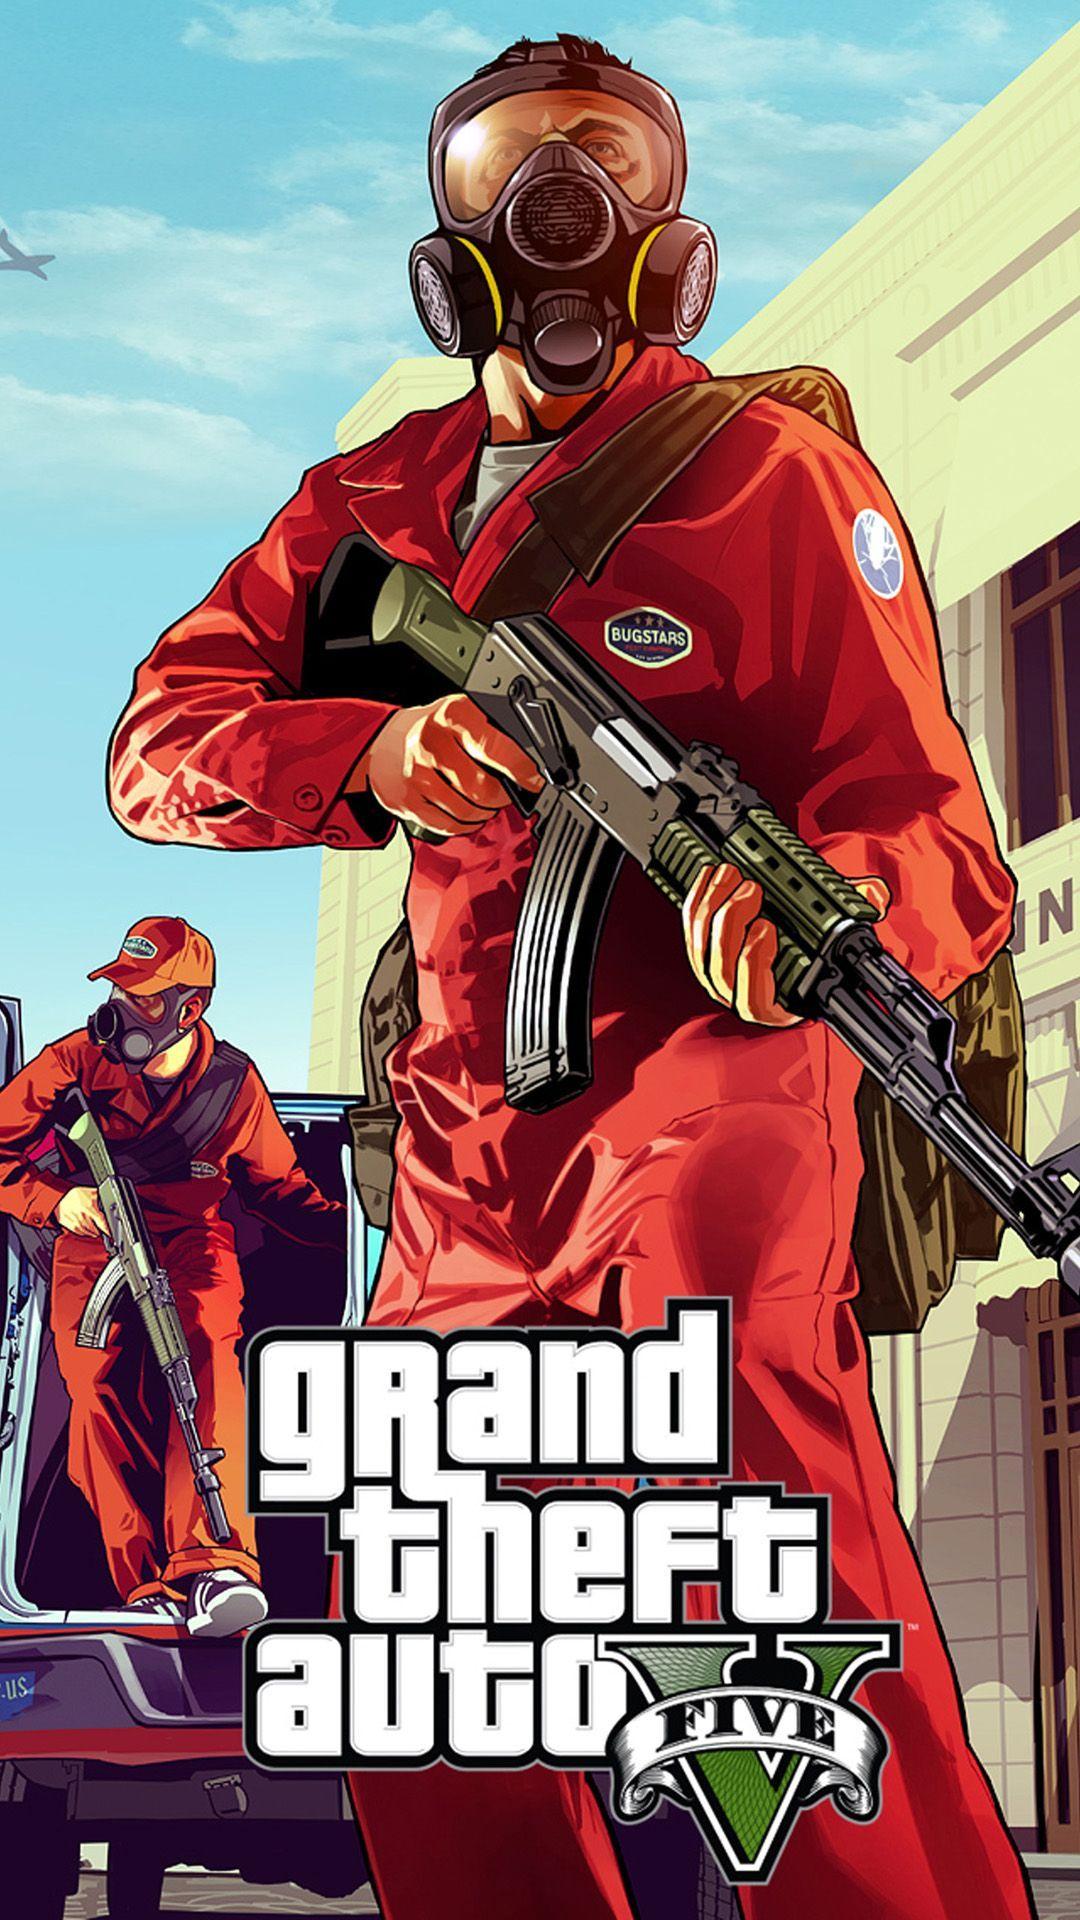 Trevor Gta V Wallpaper Android Download San Andreas Gta Gta Gta 5